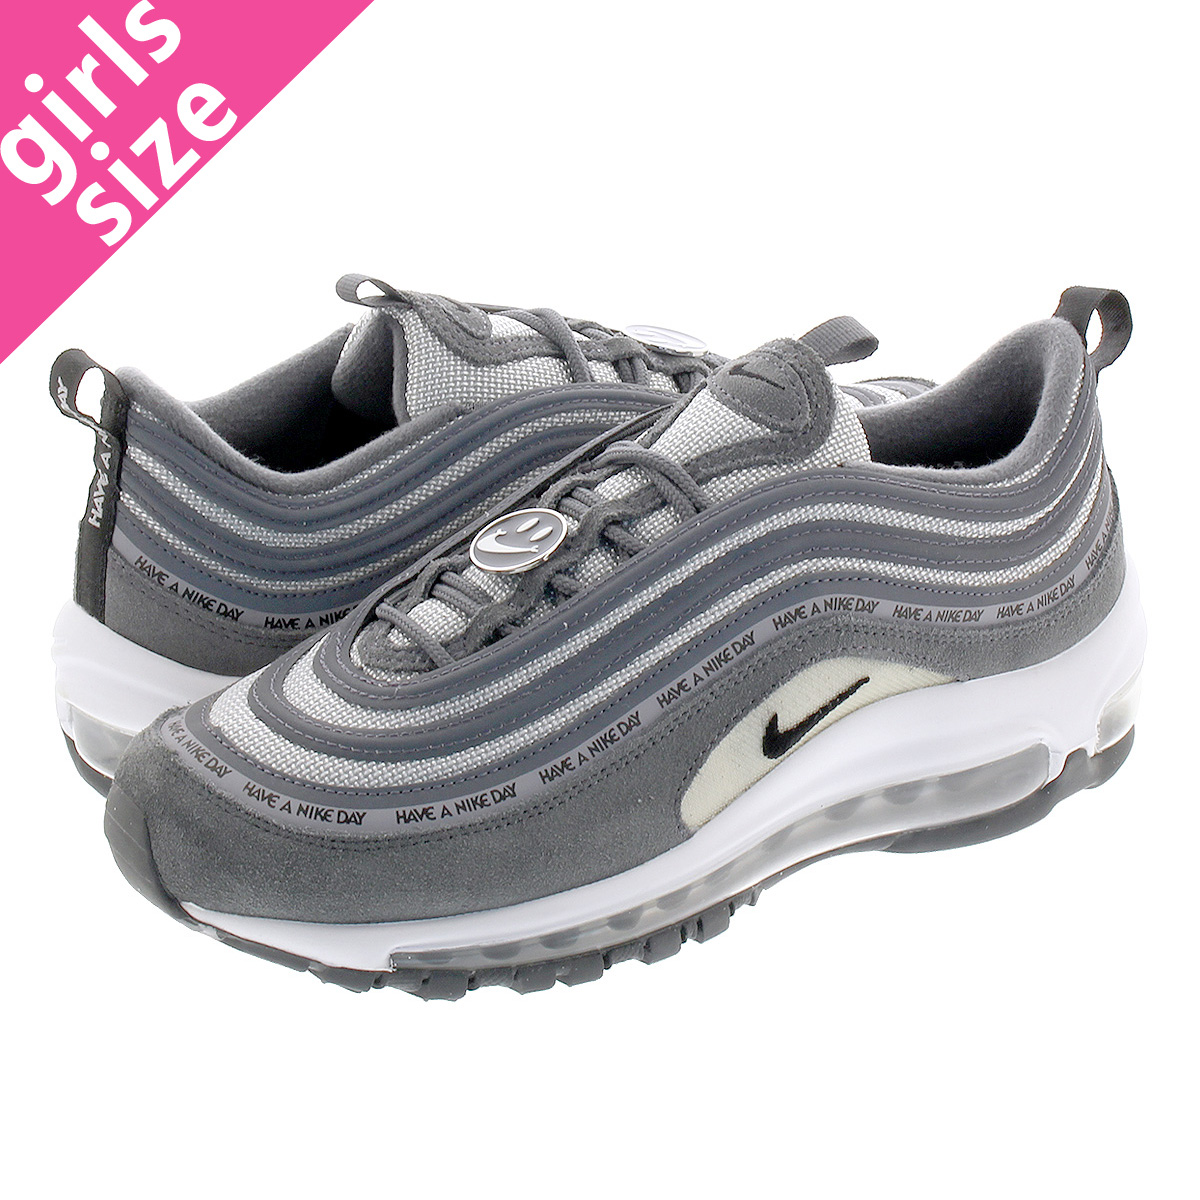 Nike Shoes Air Max 97 Jdi Poshmark